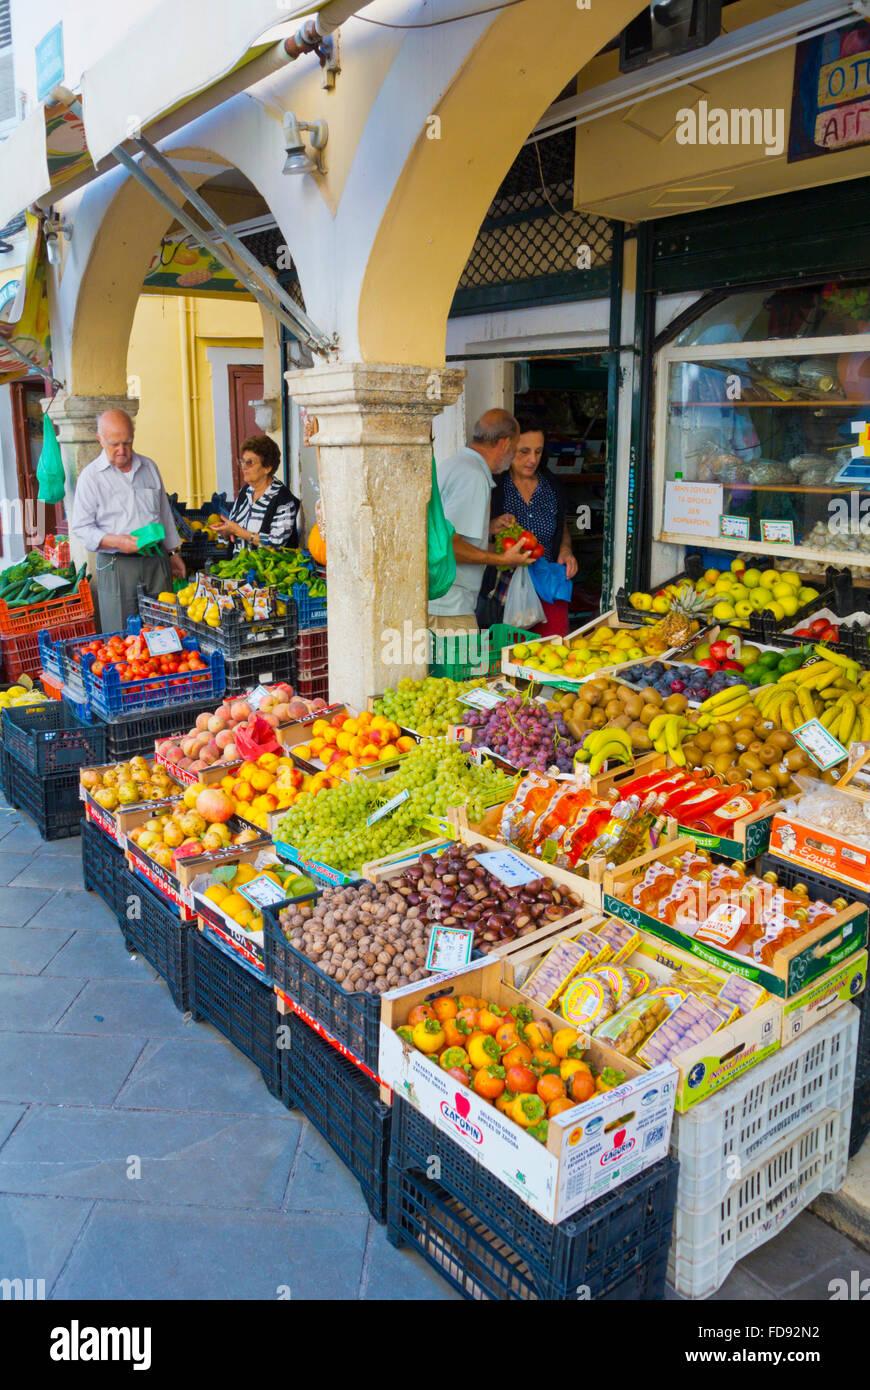 Grocery shop, Nikiforou Theotoki street, Old town, Corfu, Ionian islands, Greece - Stock Image